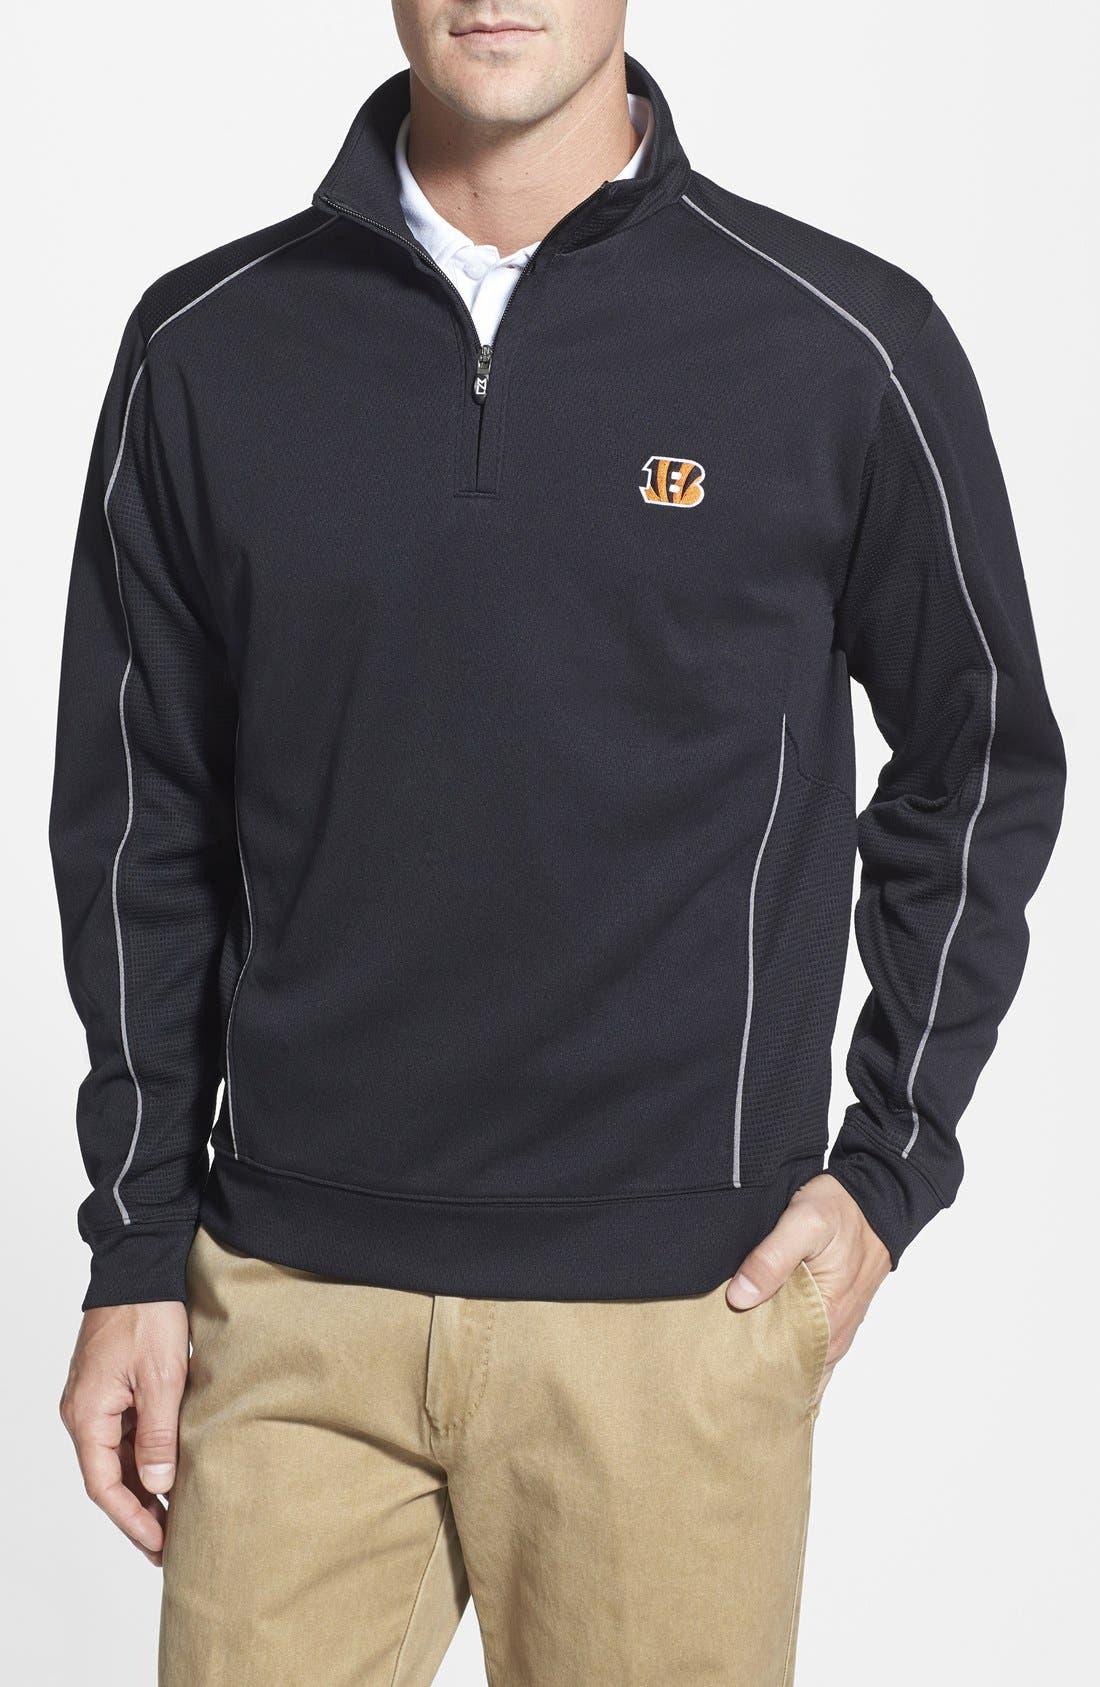 Cincinnati Bengals - Edge DryTec Moisture Wicking Half Zip Pullover,                         Main,                         color, Black